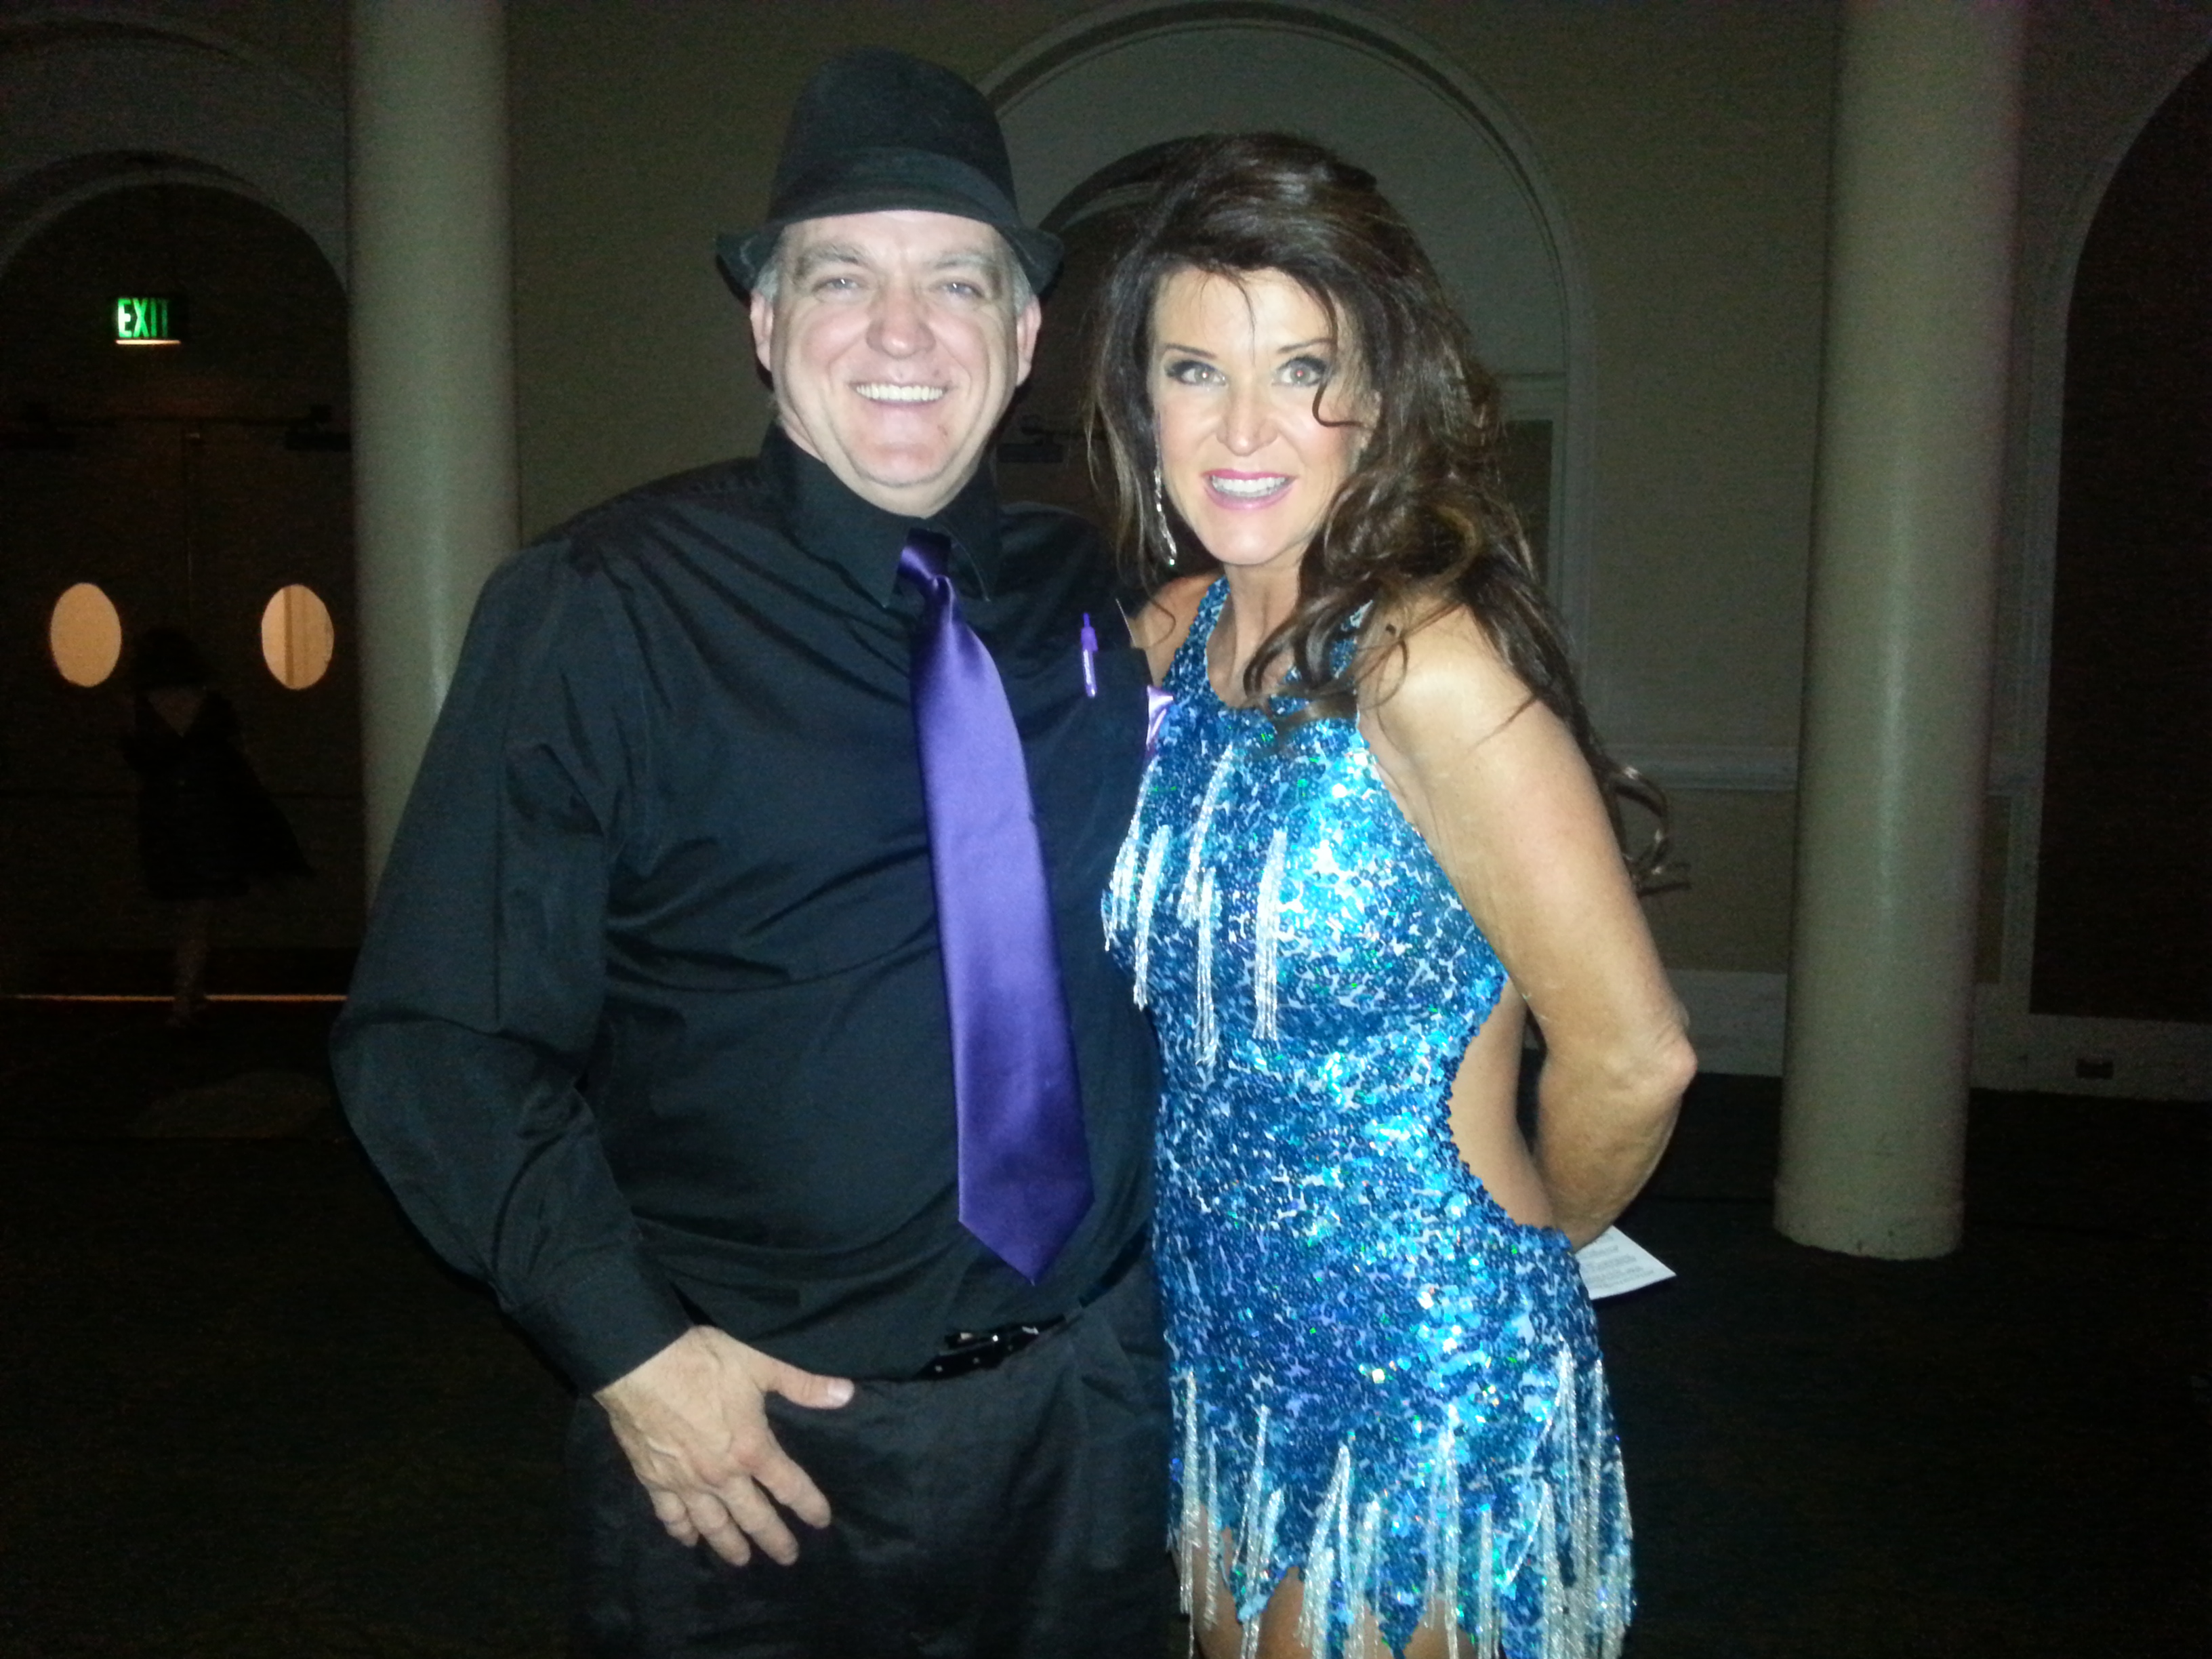 Daniel with Virginia Shaheen, 2013 Judges' Choice winner